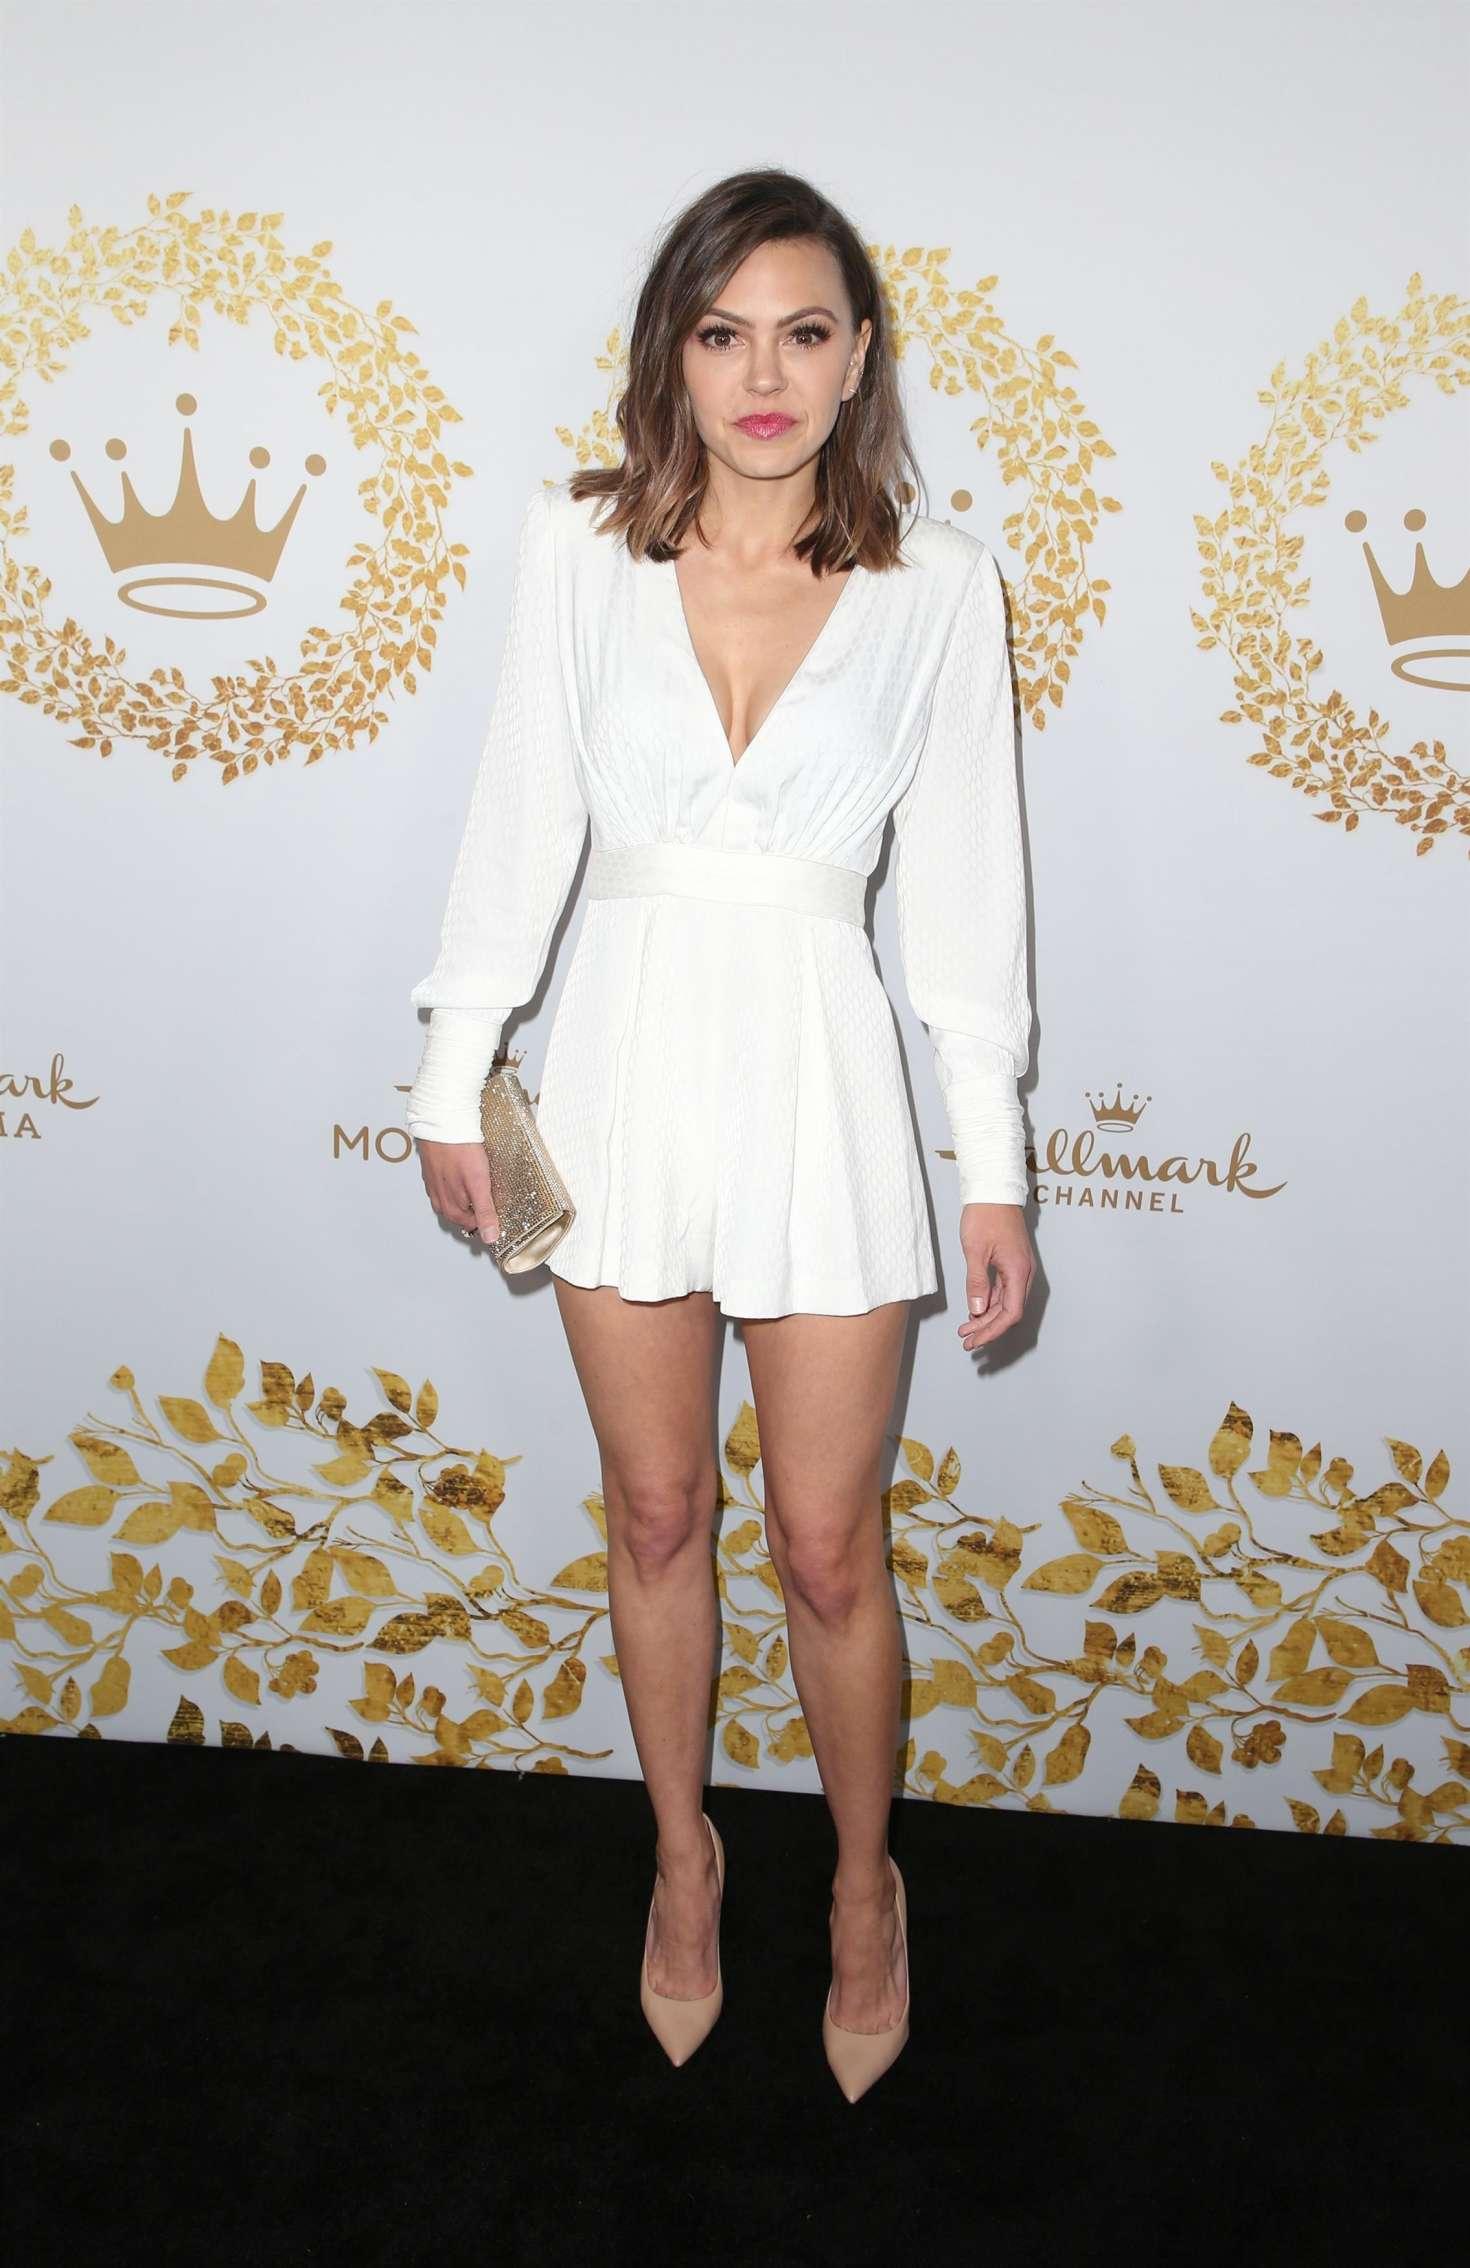 Aimee Teegarden 2019 : Aimee Teegarden: Hallmark Channel 2019 Winter TCA Tour -01